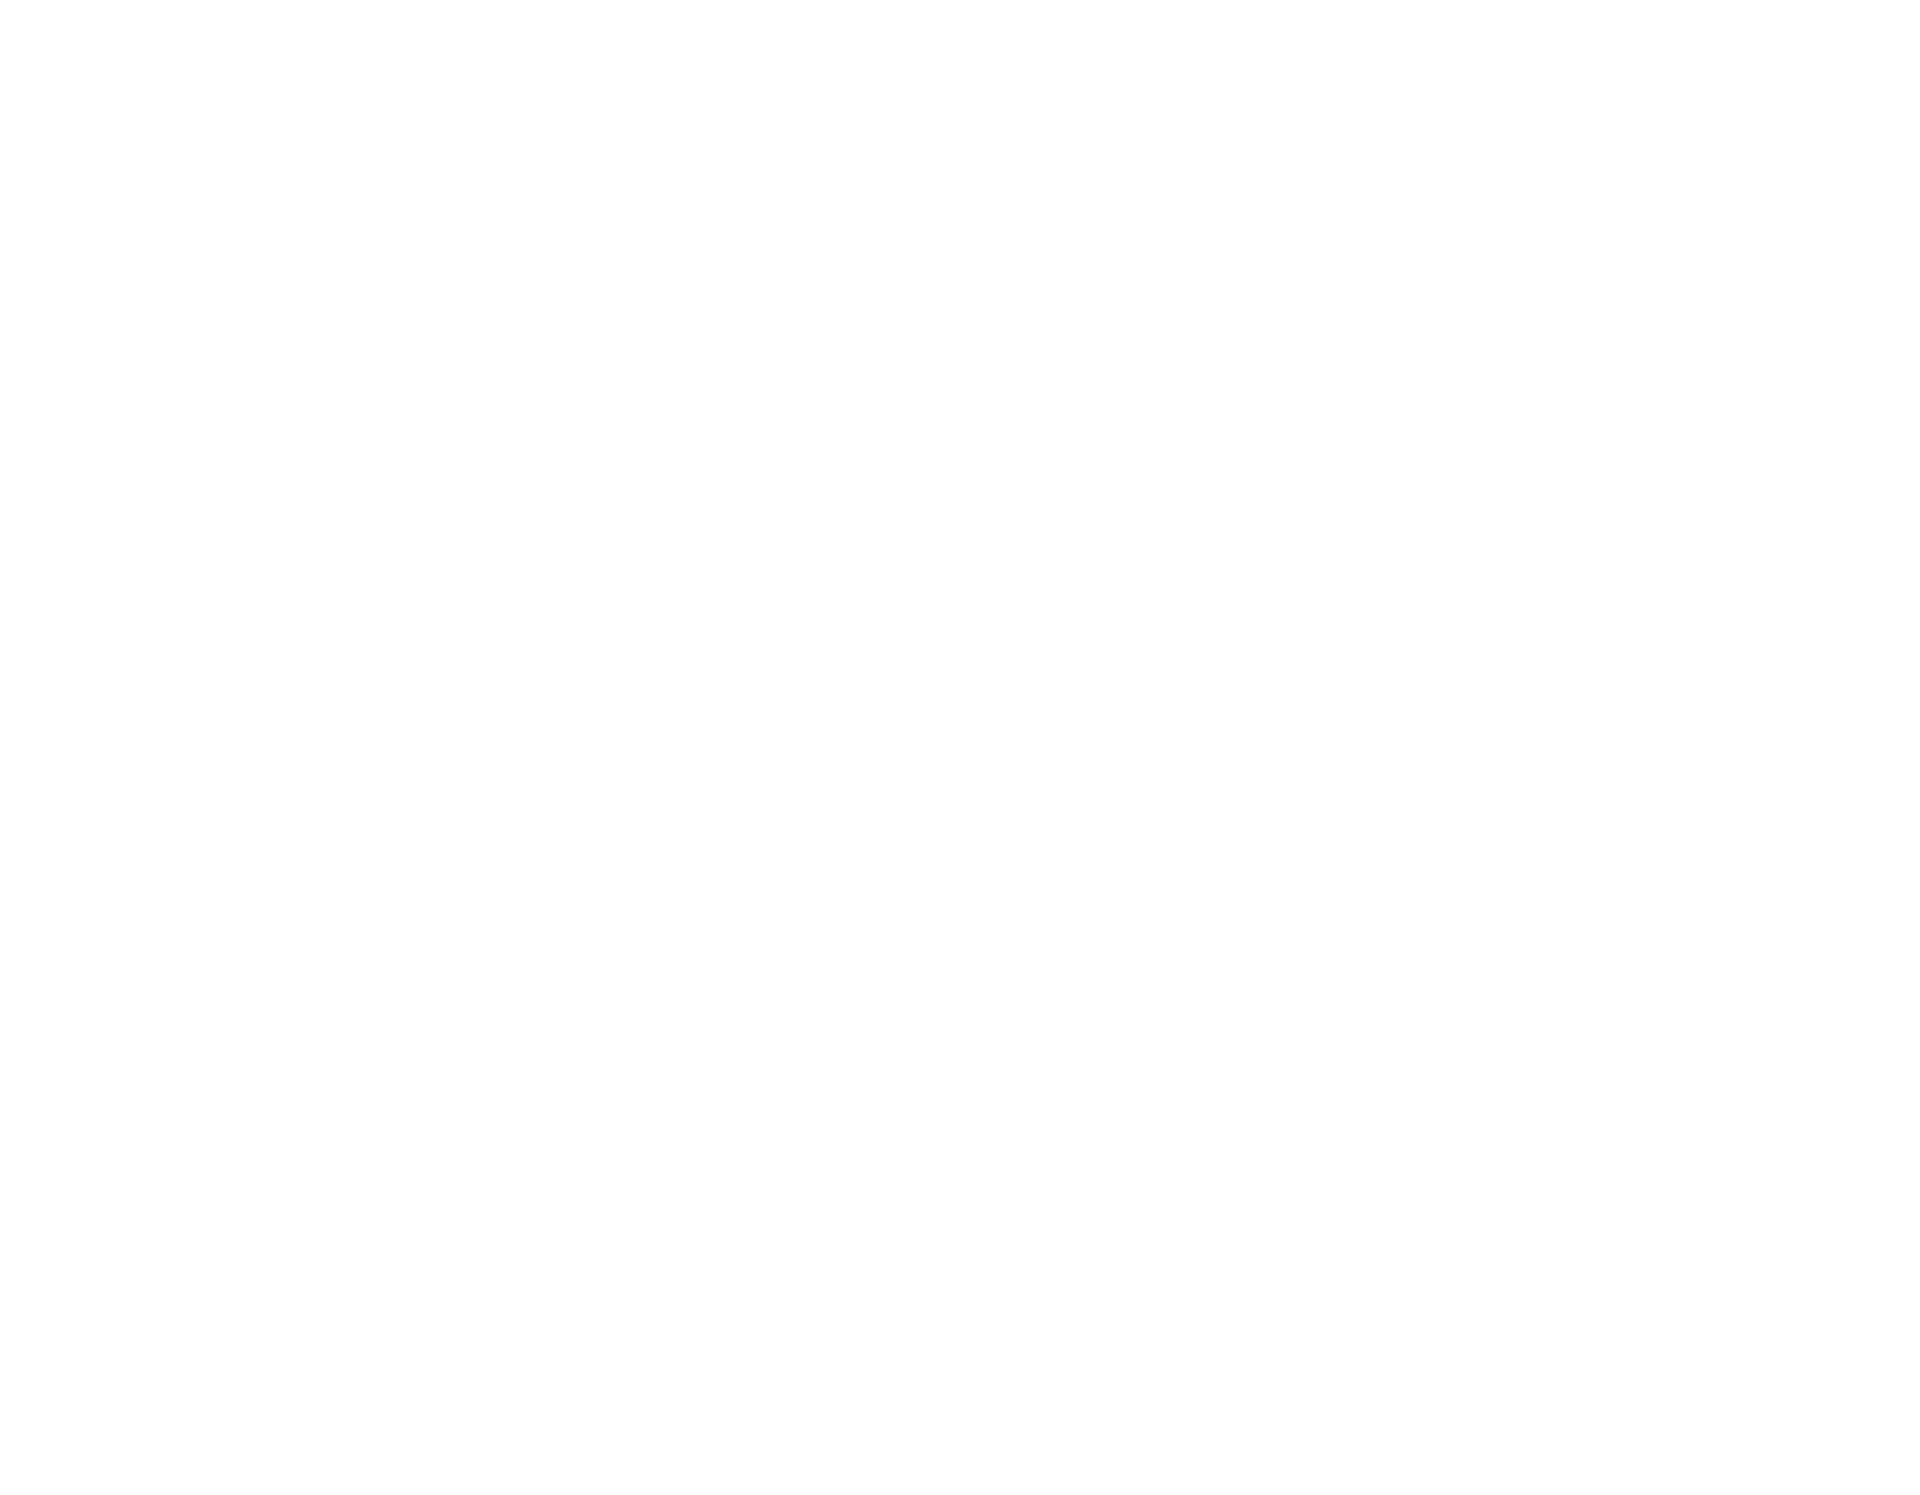 Jim Henson's Labyrinth adventure game